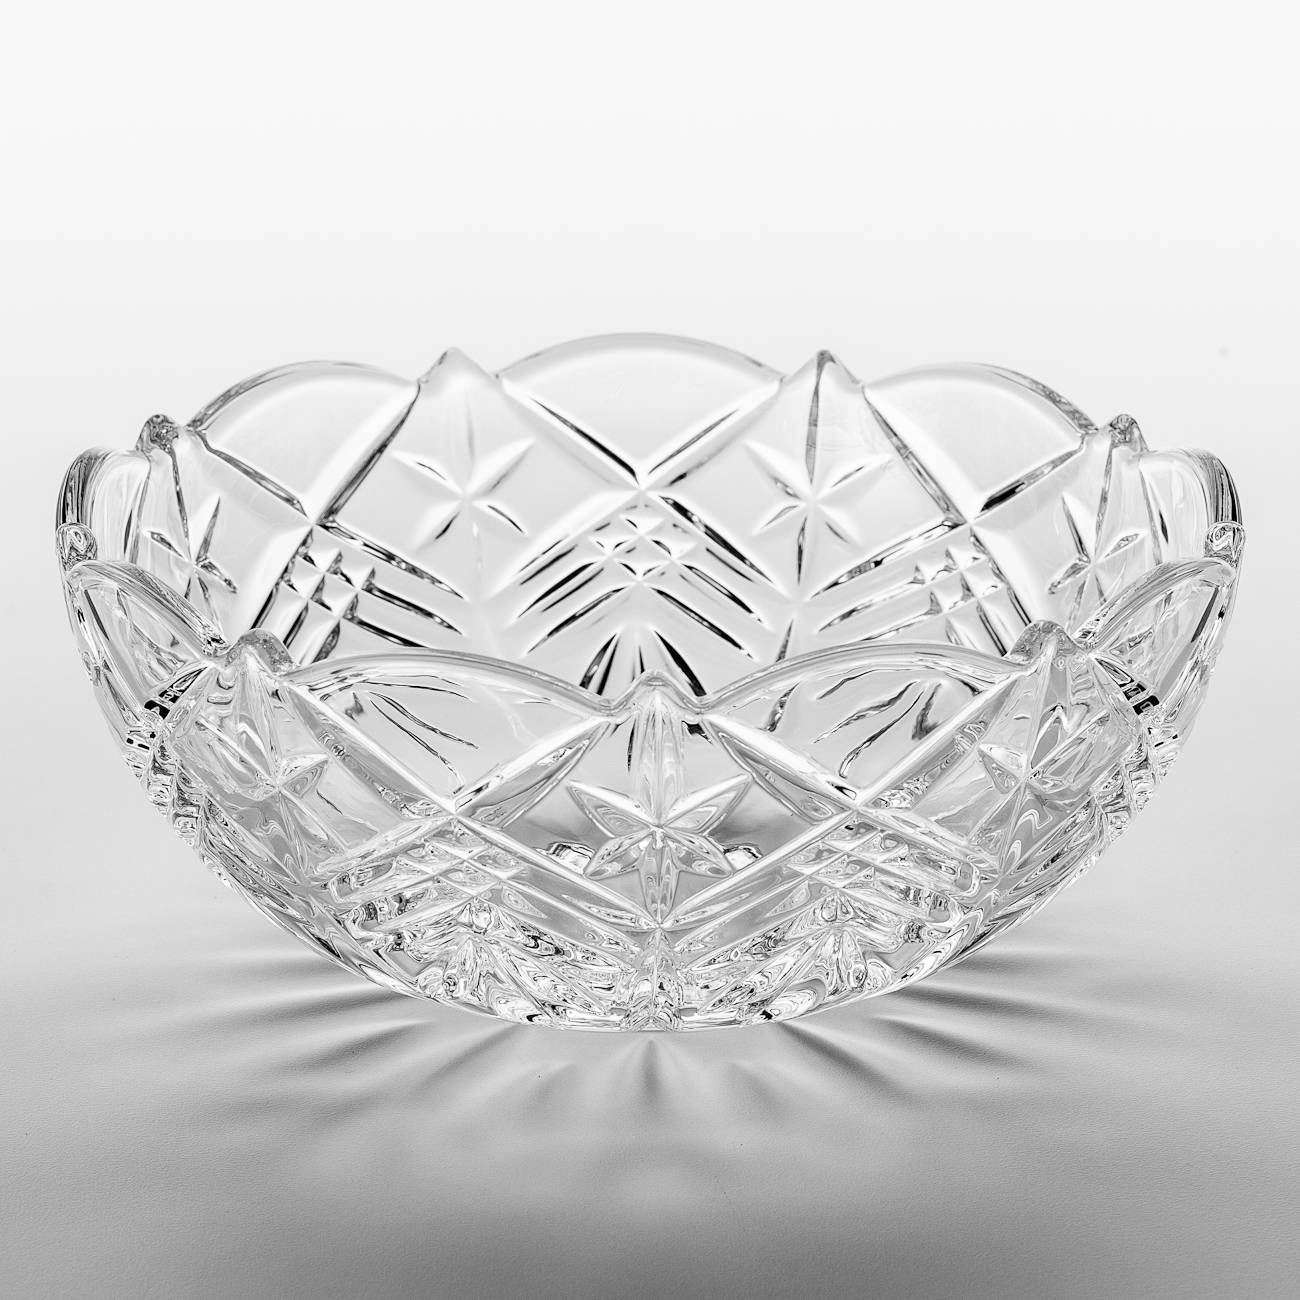 Saladeira Taurus em Cristal - Bohemia Crystalite - 22 cm